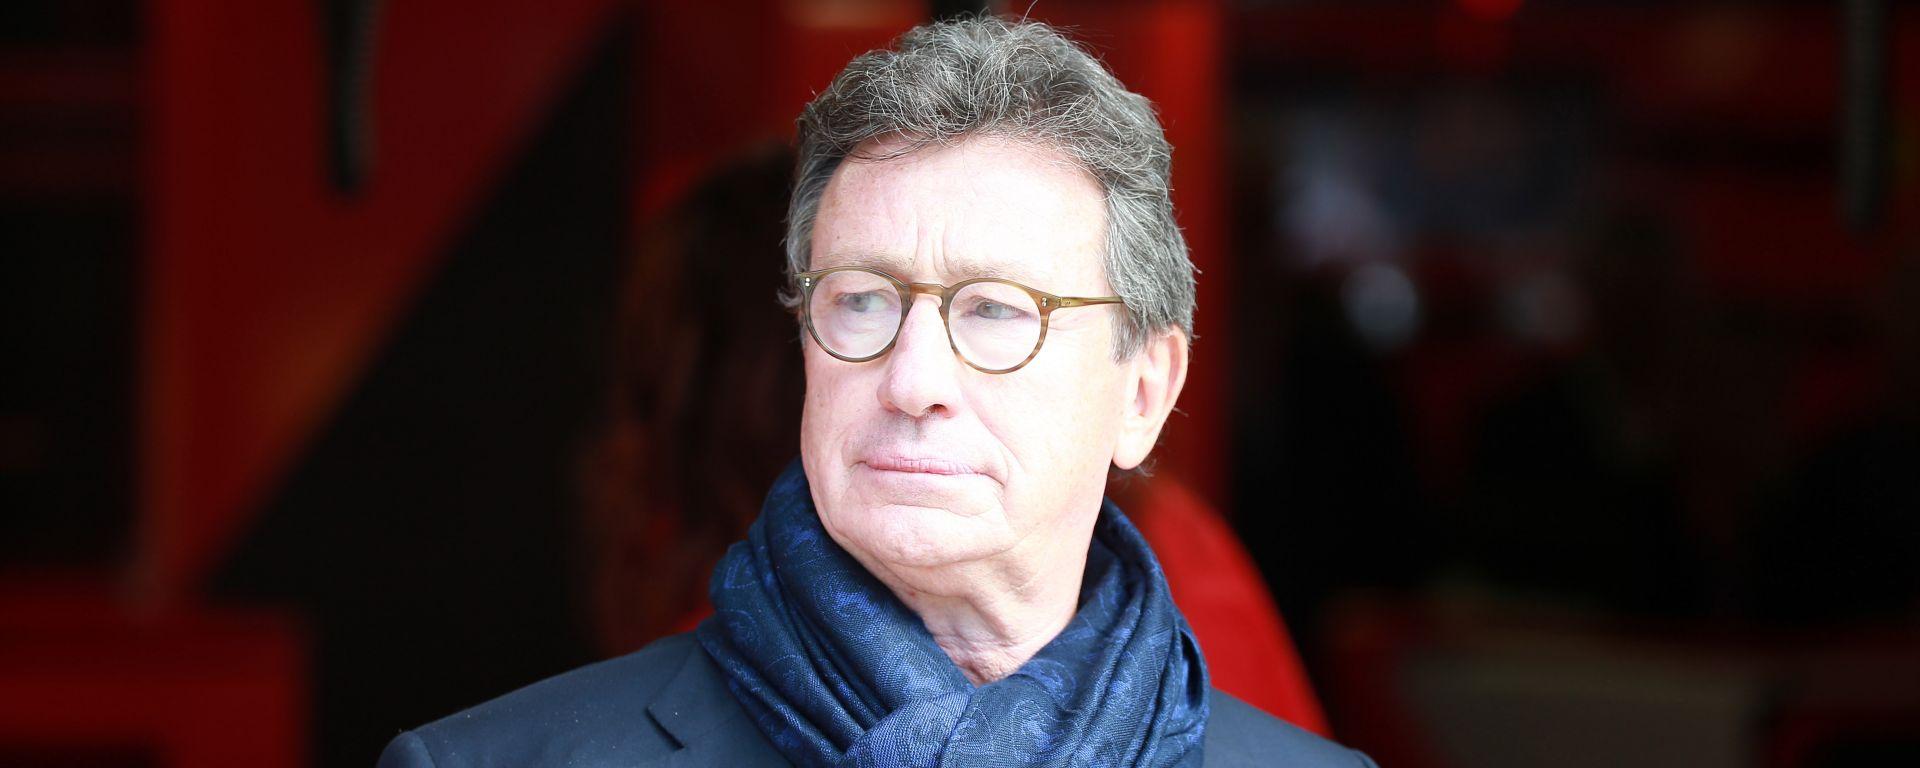 F1 GP Italia 2019, Monza: Louis Camilleri, presidente Ferrari